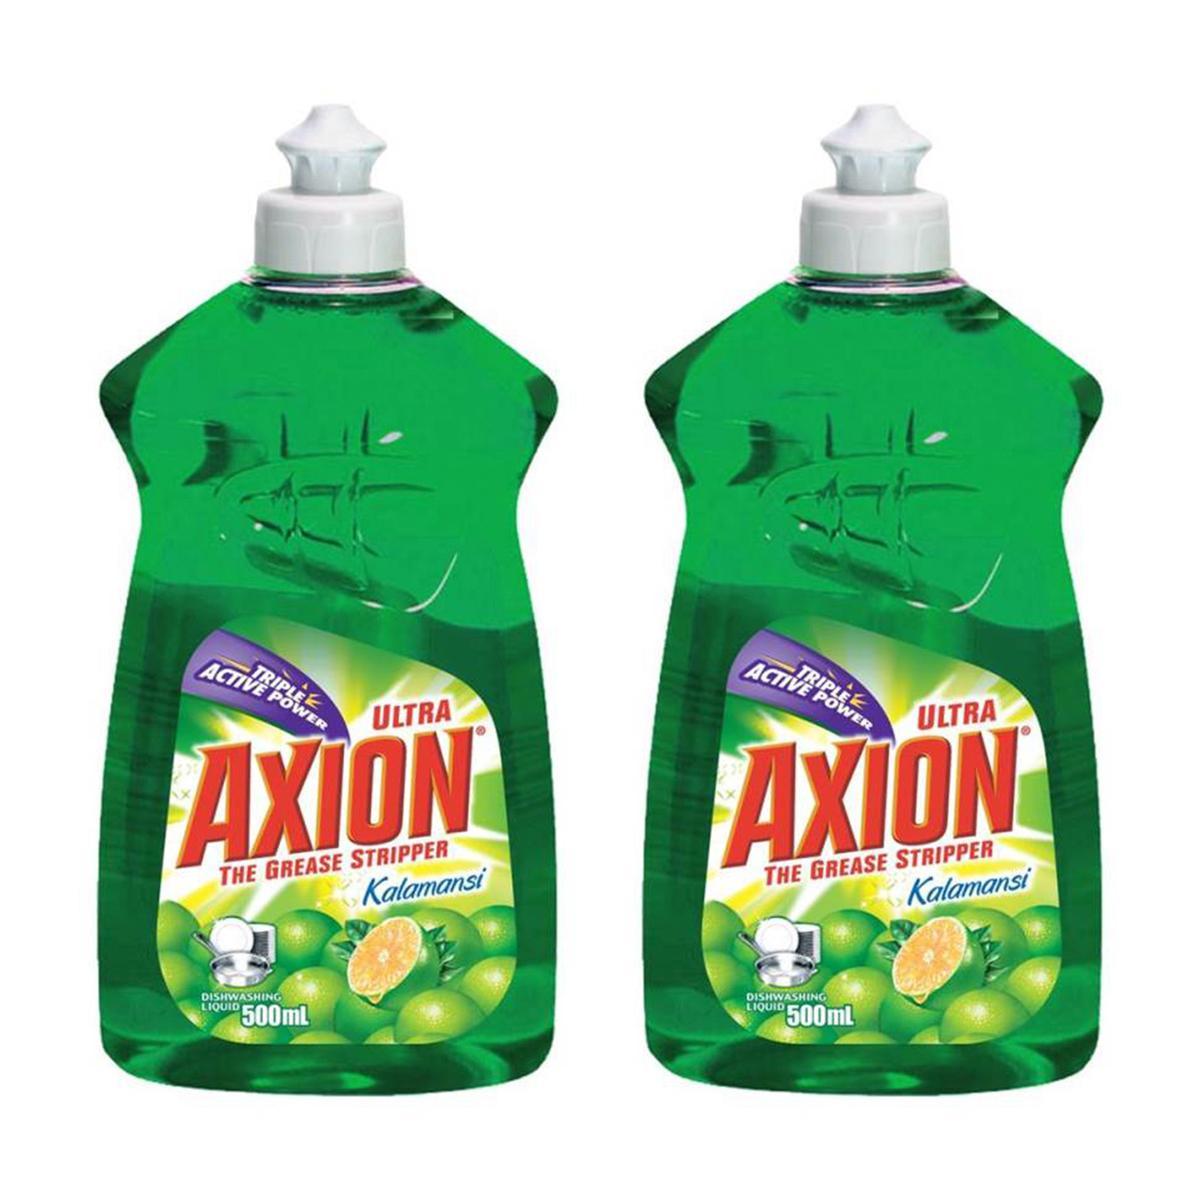 Axion Dishwashing Liquid Kalamansi 500ml, Pack Of 2 By Lazada Retail Sulit Finds.